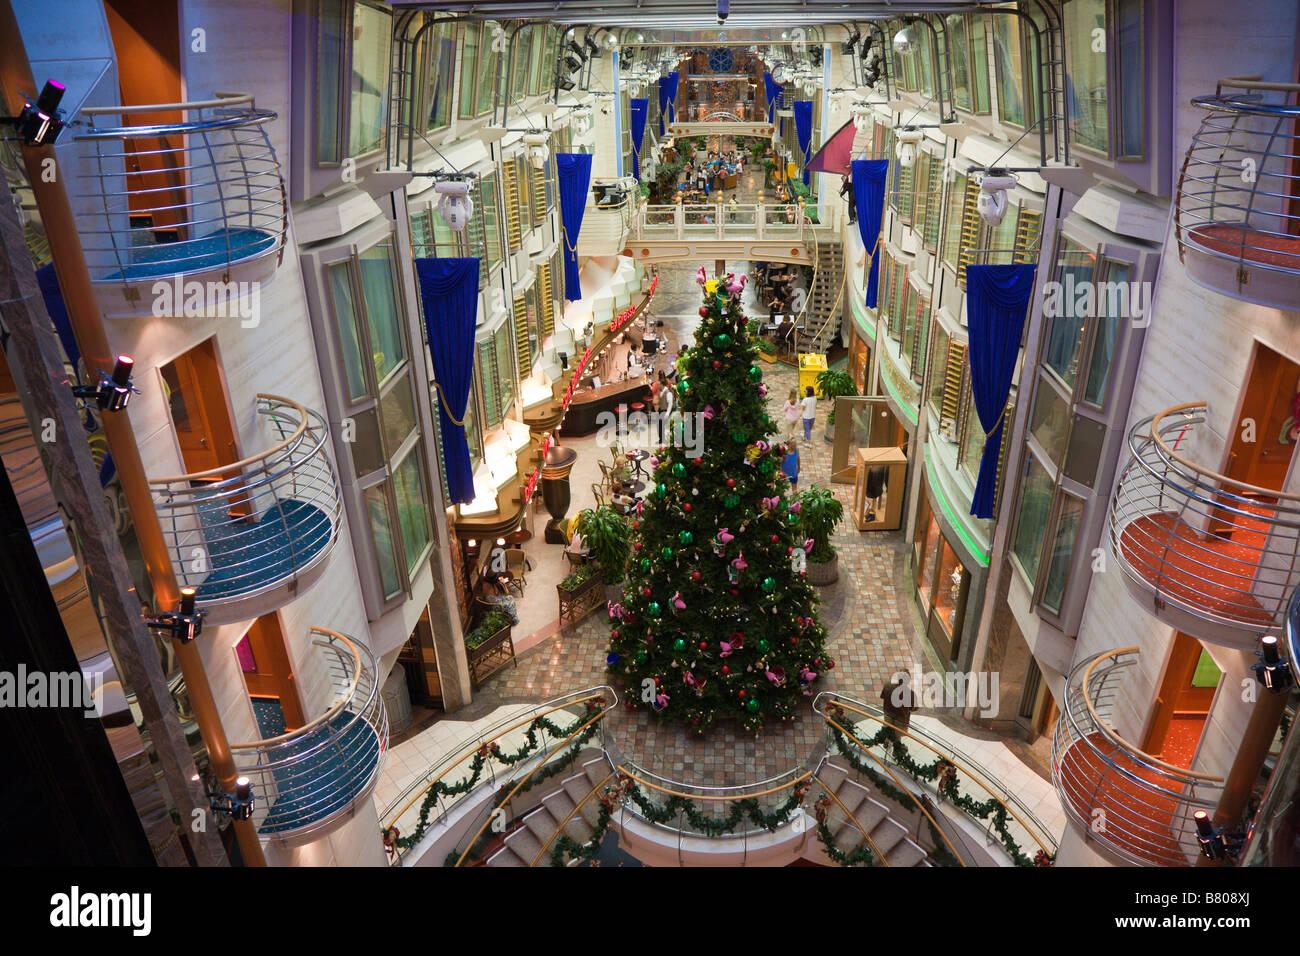 Royal Caribbean Cruise December 2021 Christmas Interior Of The Royal Promenade Deck Of Royal Caribbean Navigator Of The Seas Cruise Ship Stock Photo Alamy